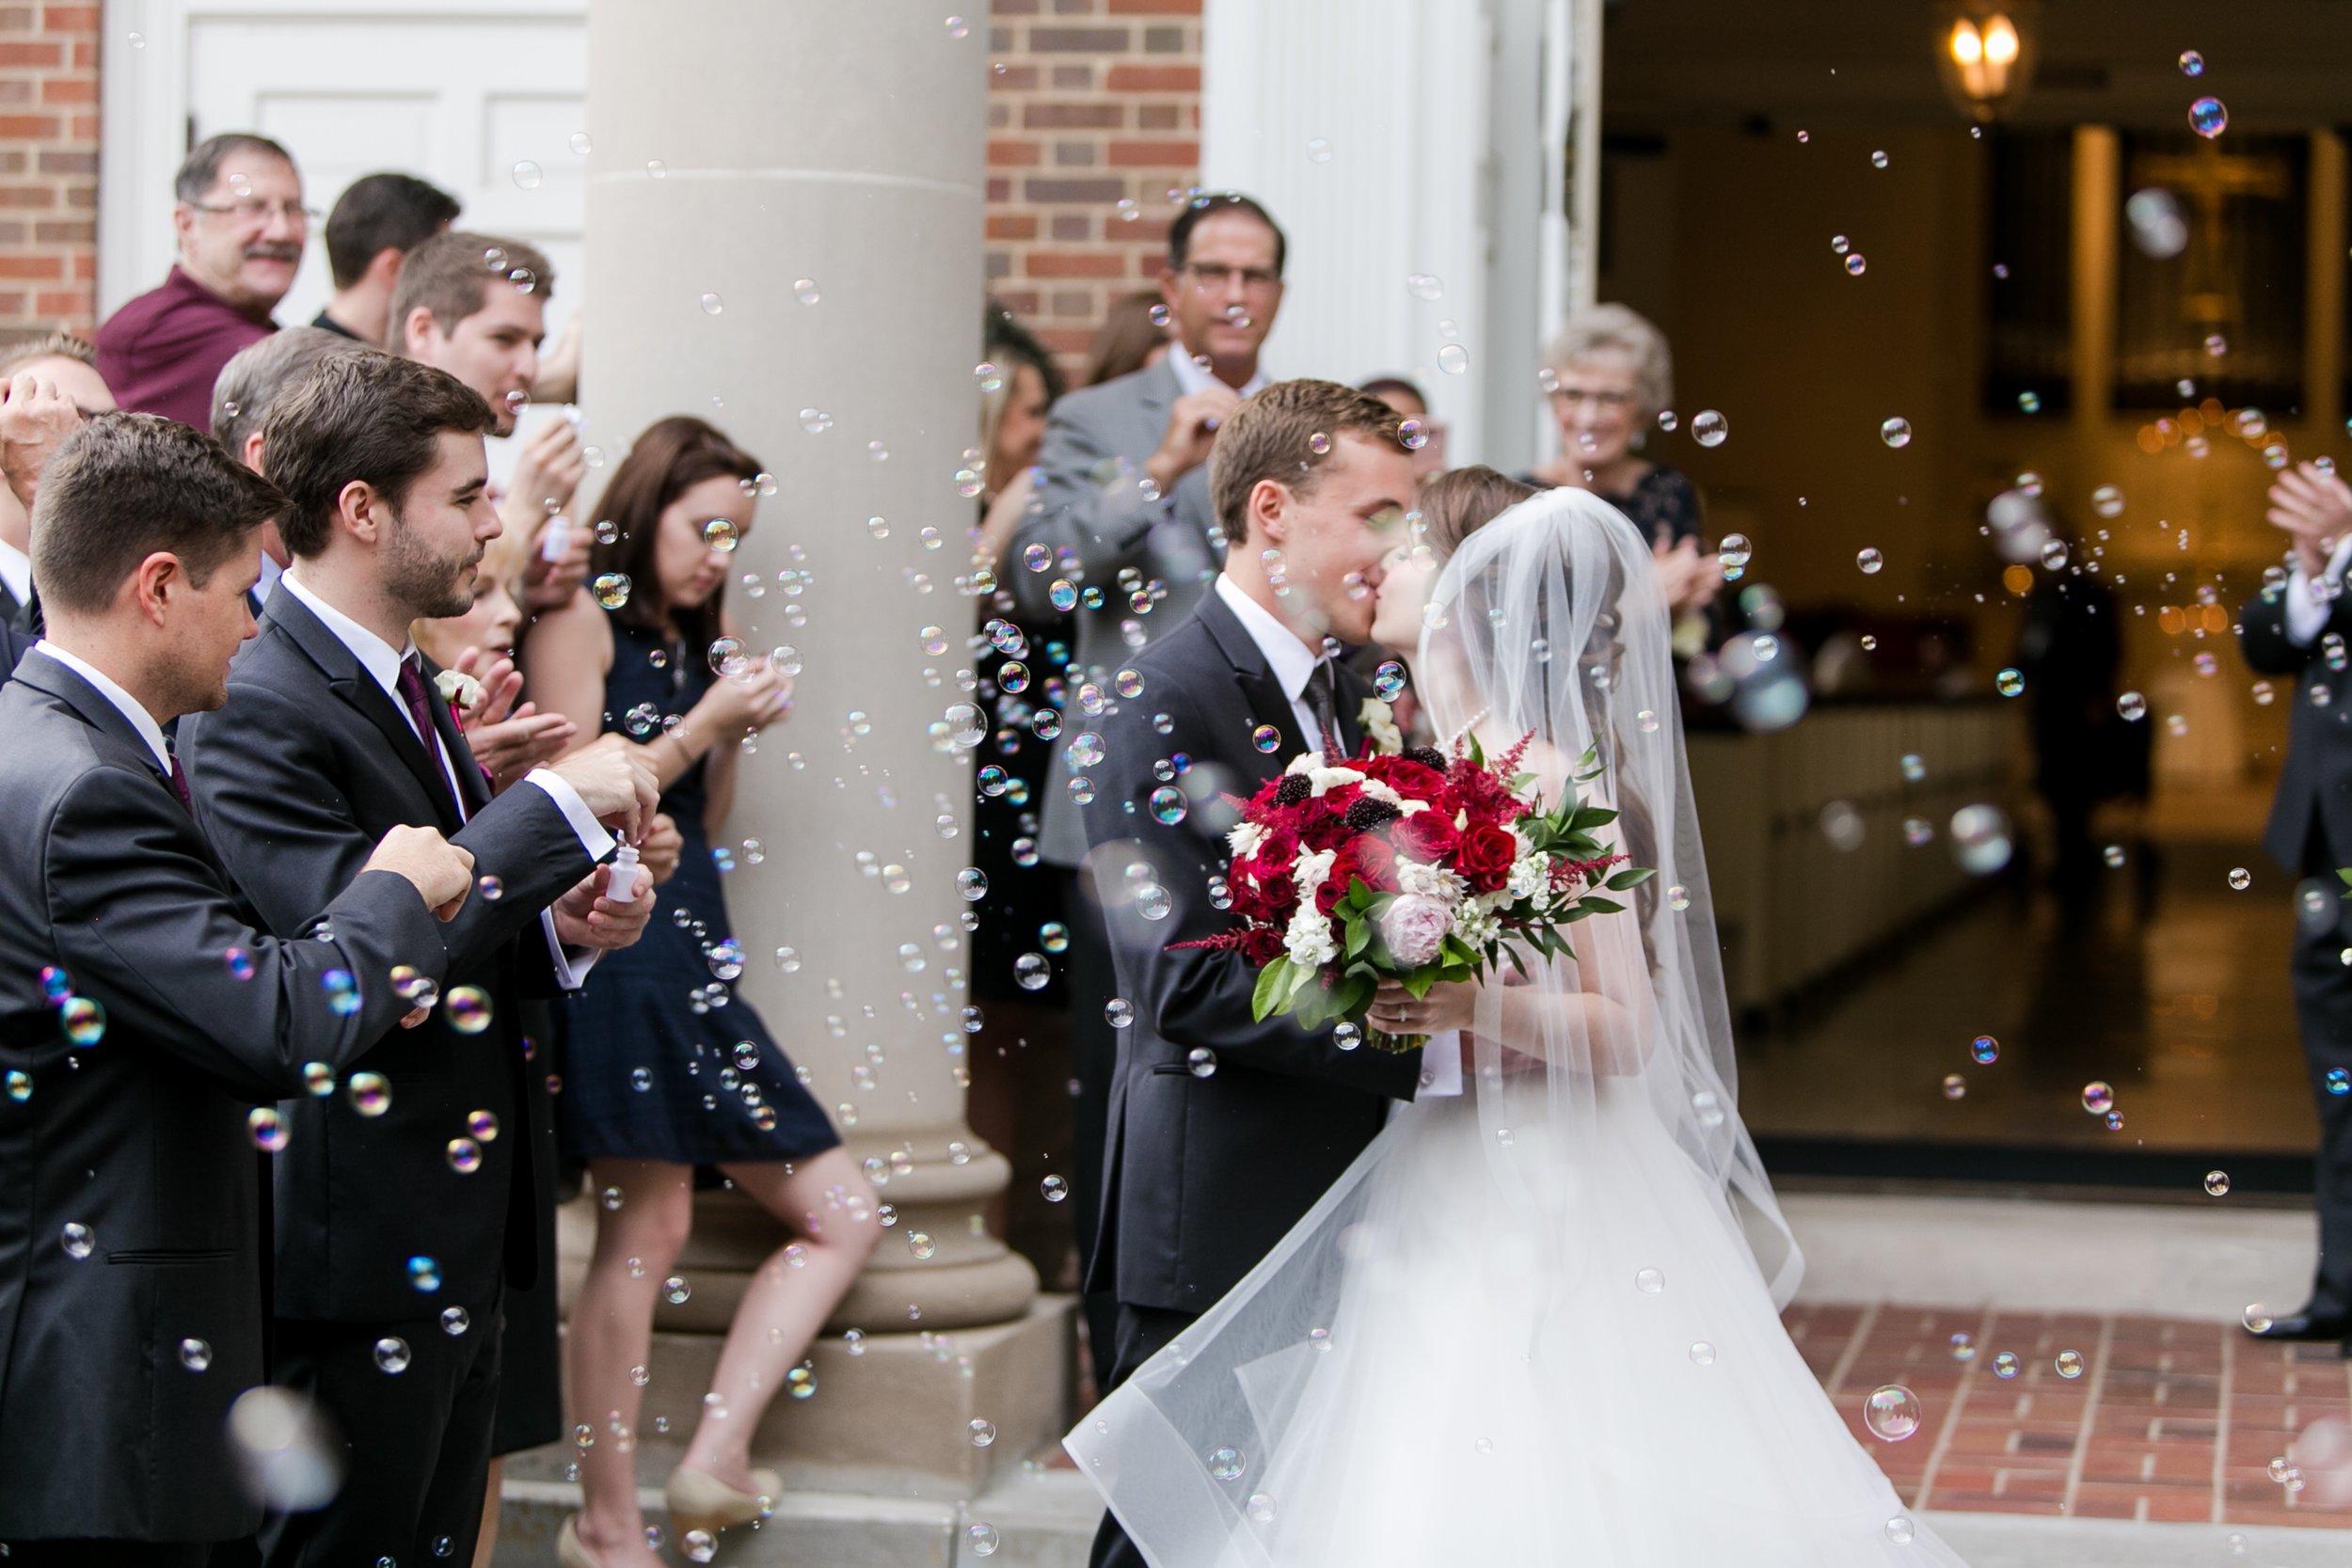 2017Sept9-Kay-Wedding-MissionTheatre-0492.jpg